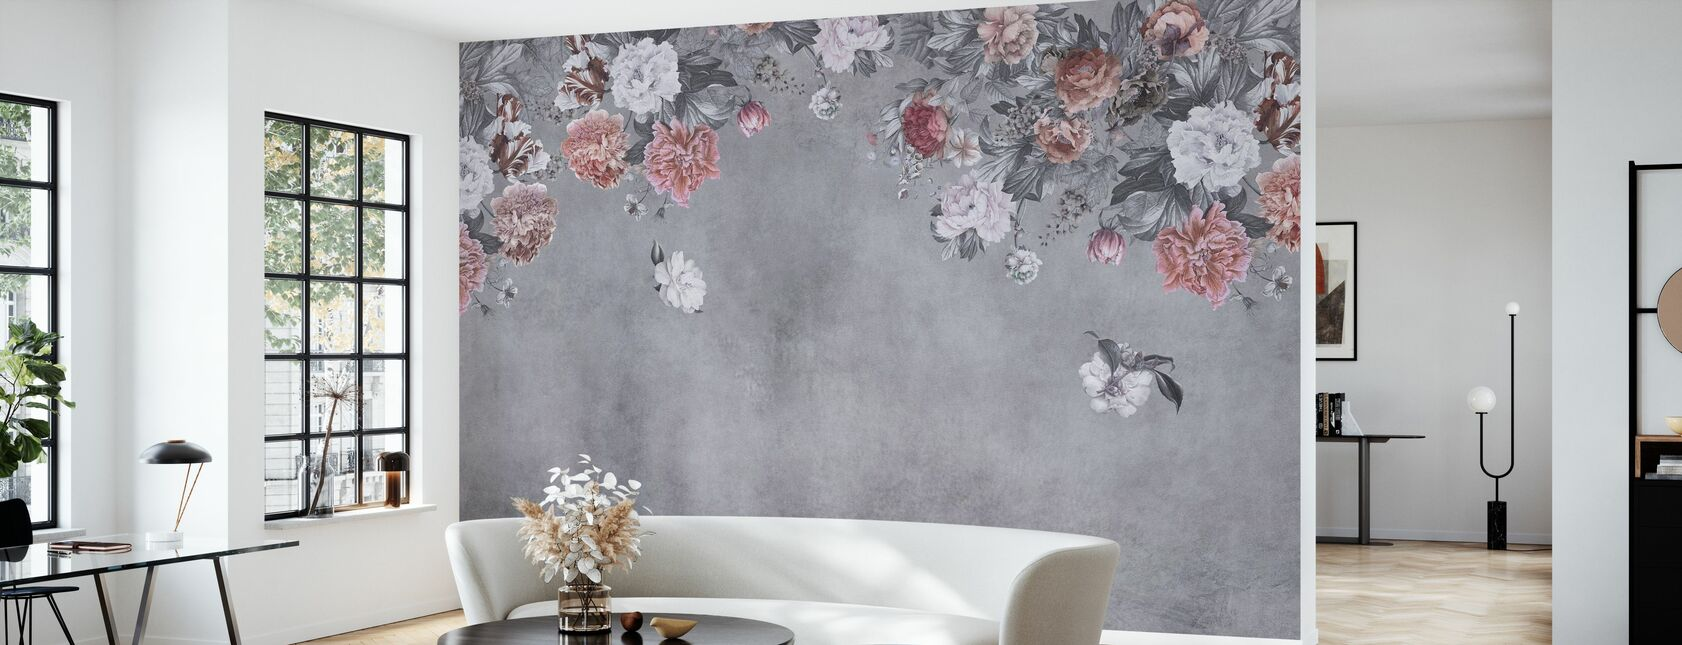 Vintage Flower Wall - Grey - Wallpaper - Living Room